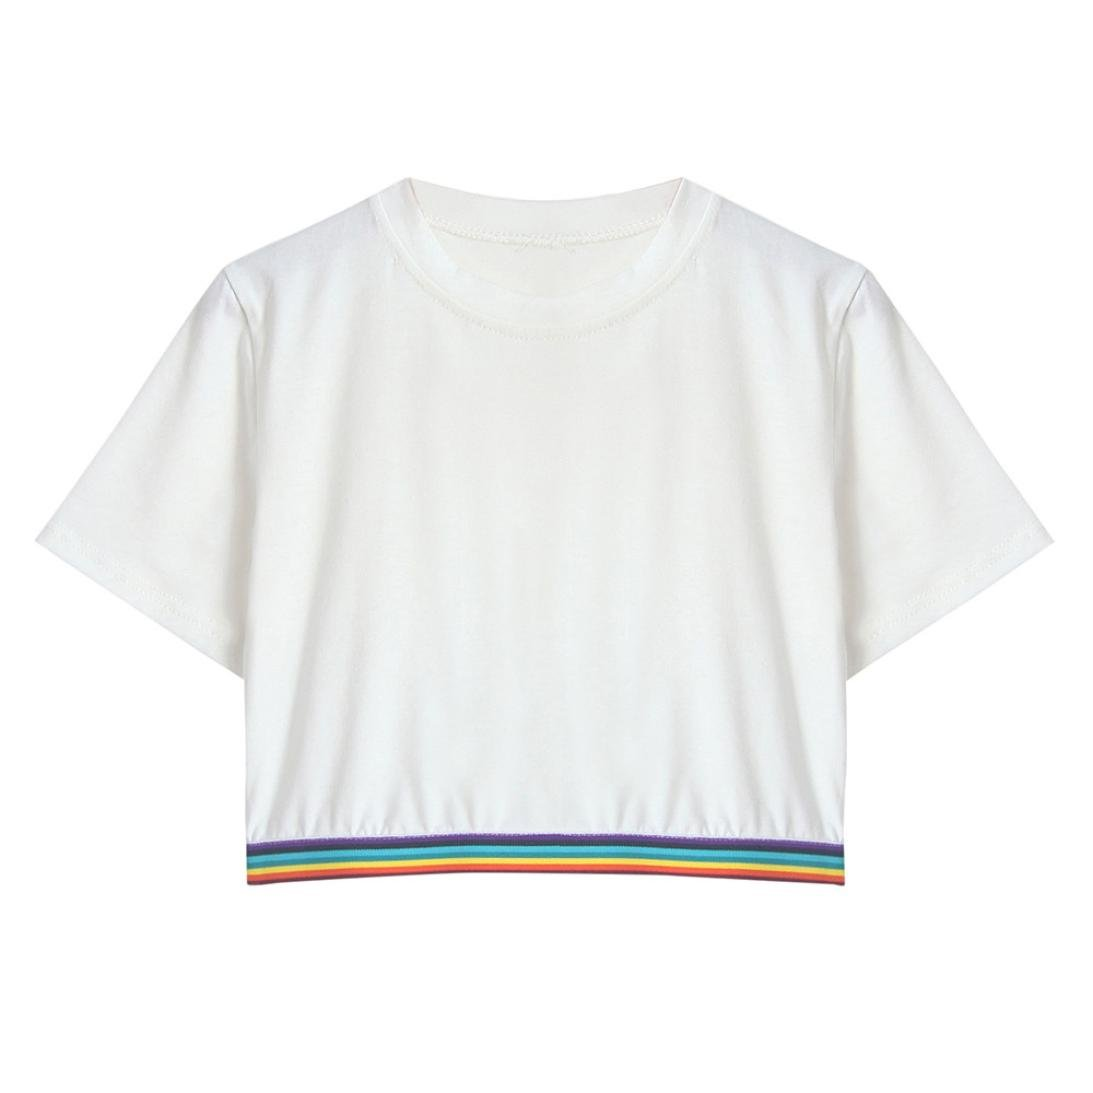 Atemberaubend Shirt Nähmustern Bilder - Strickmuster-Ideen ...